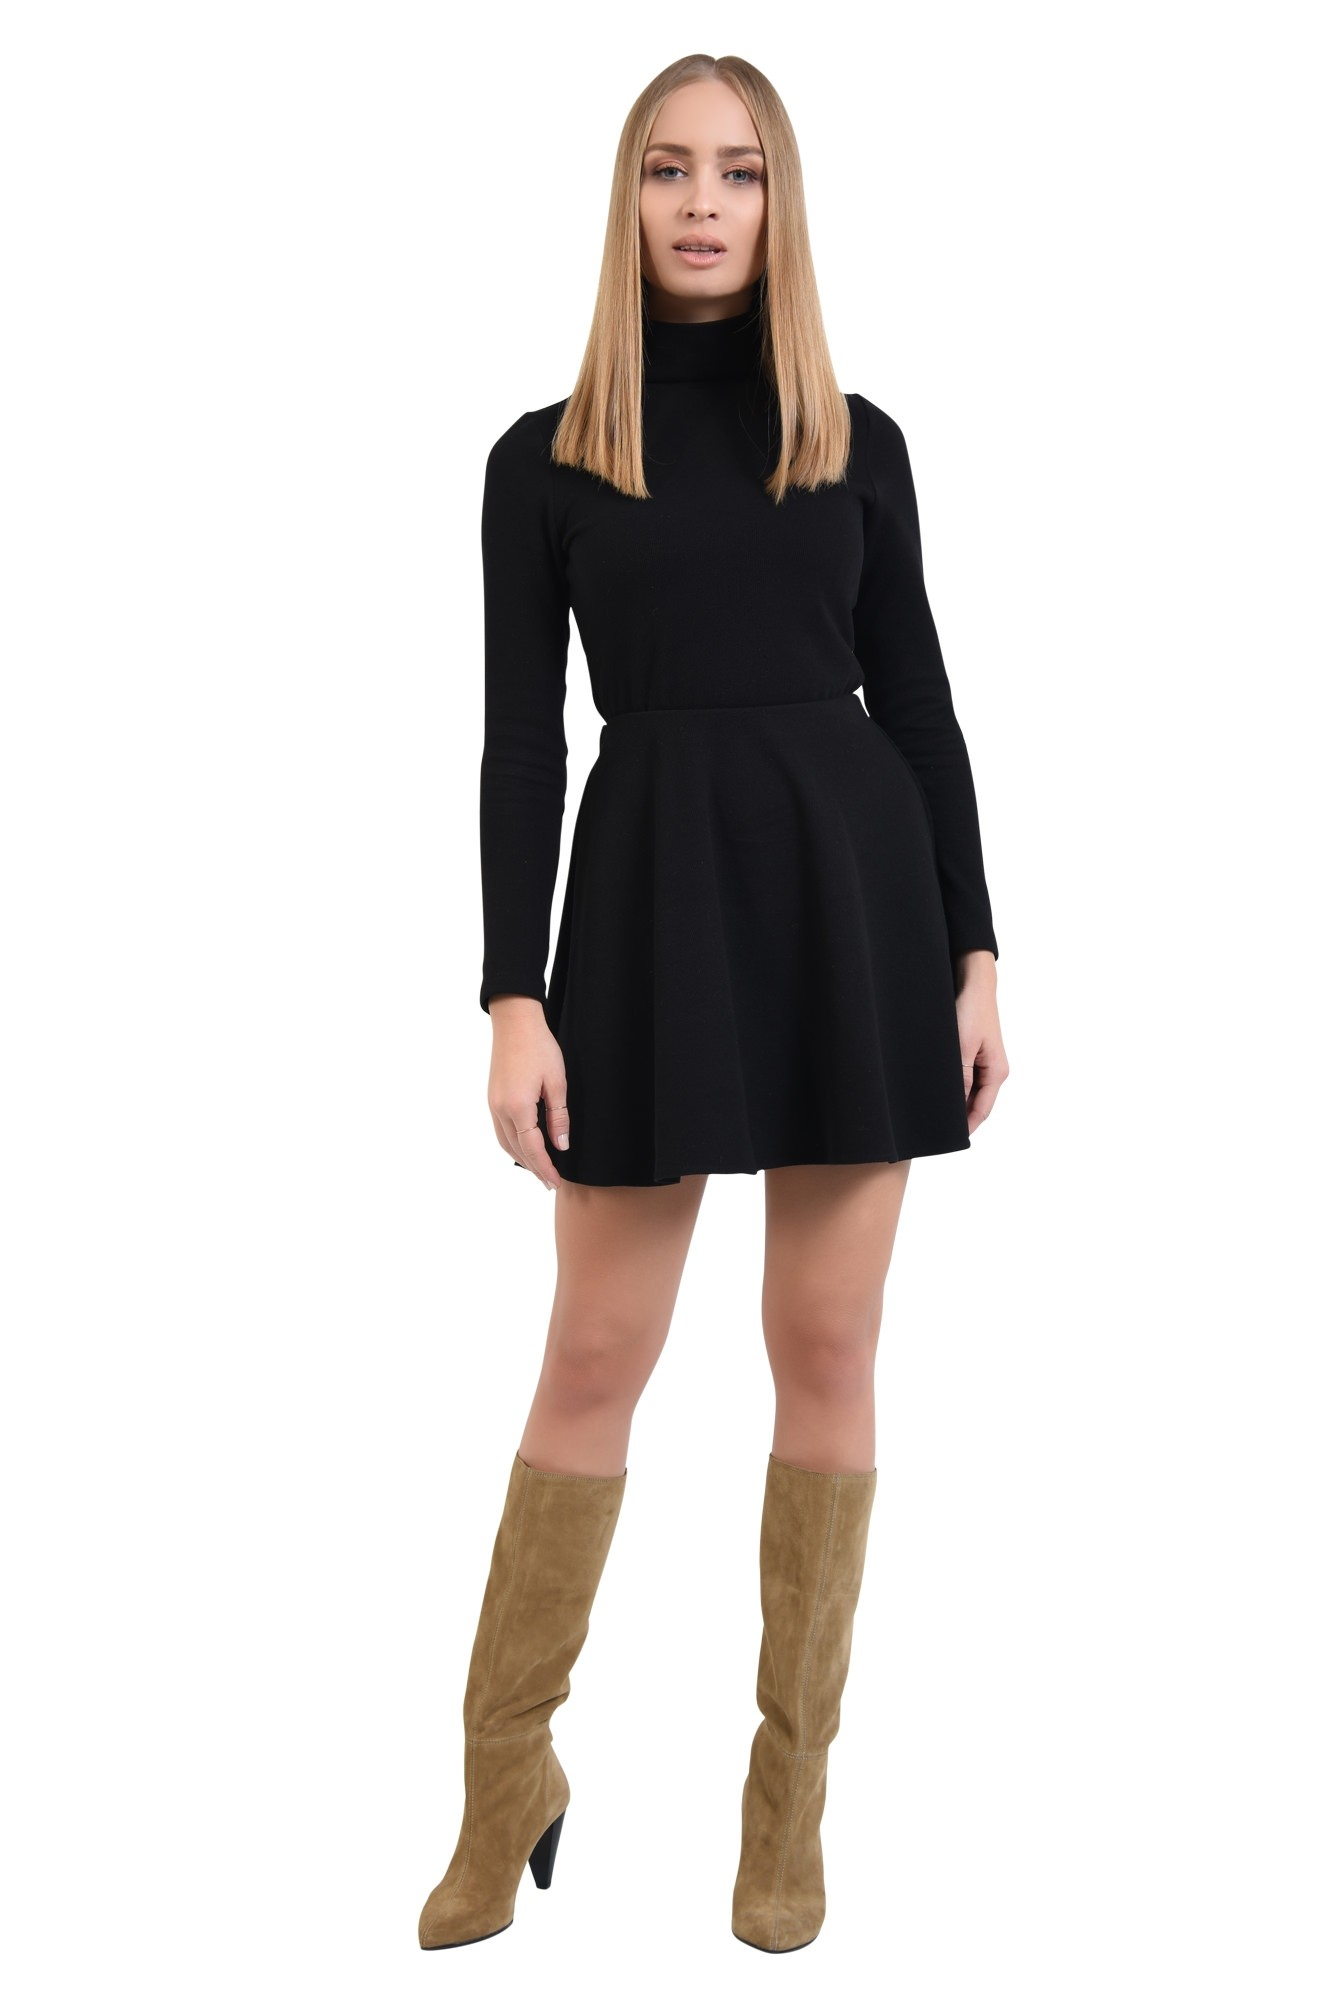 0 - fusta scurta, neagra, tricotata, croi evazat